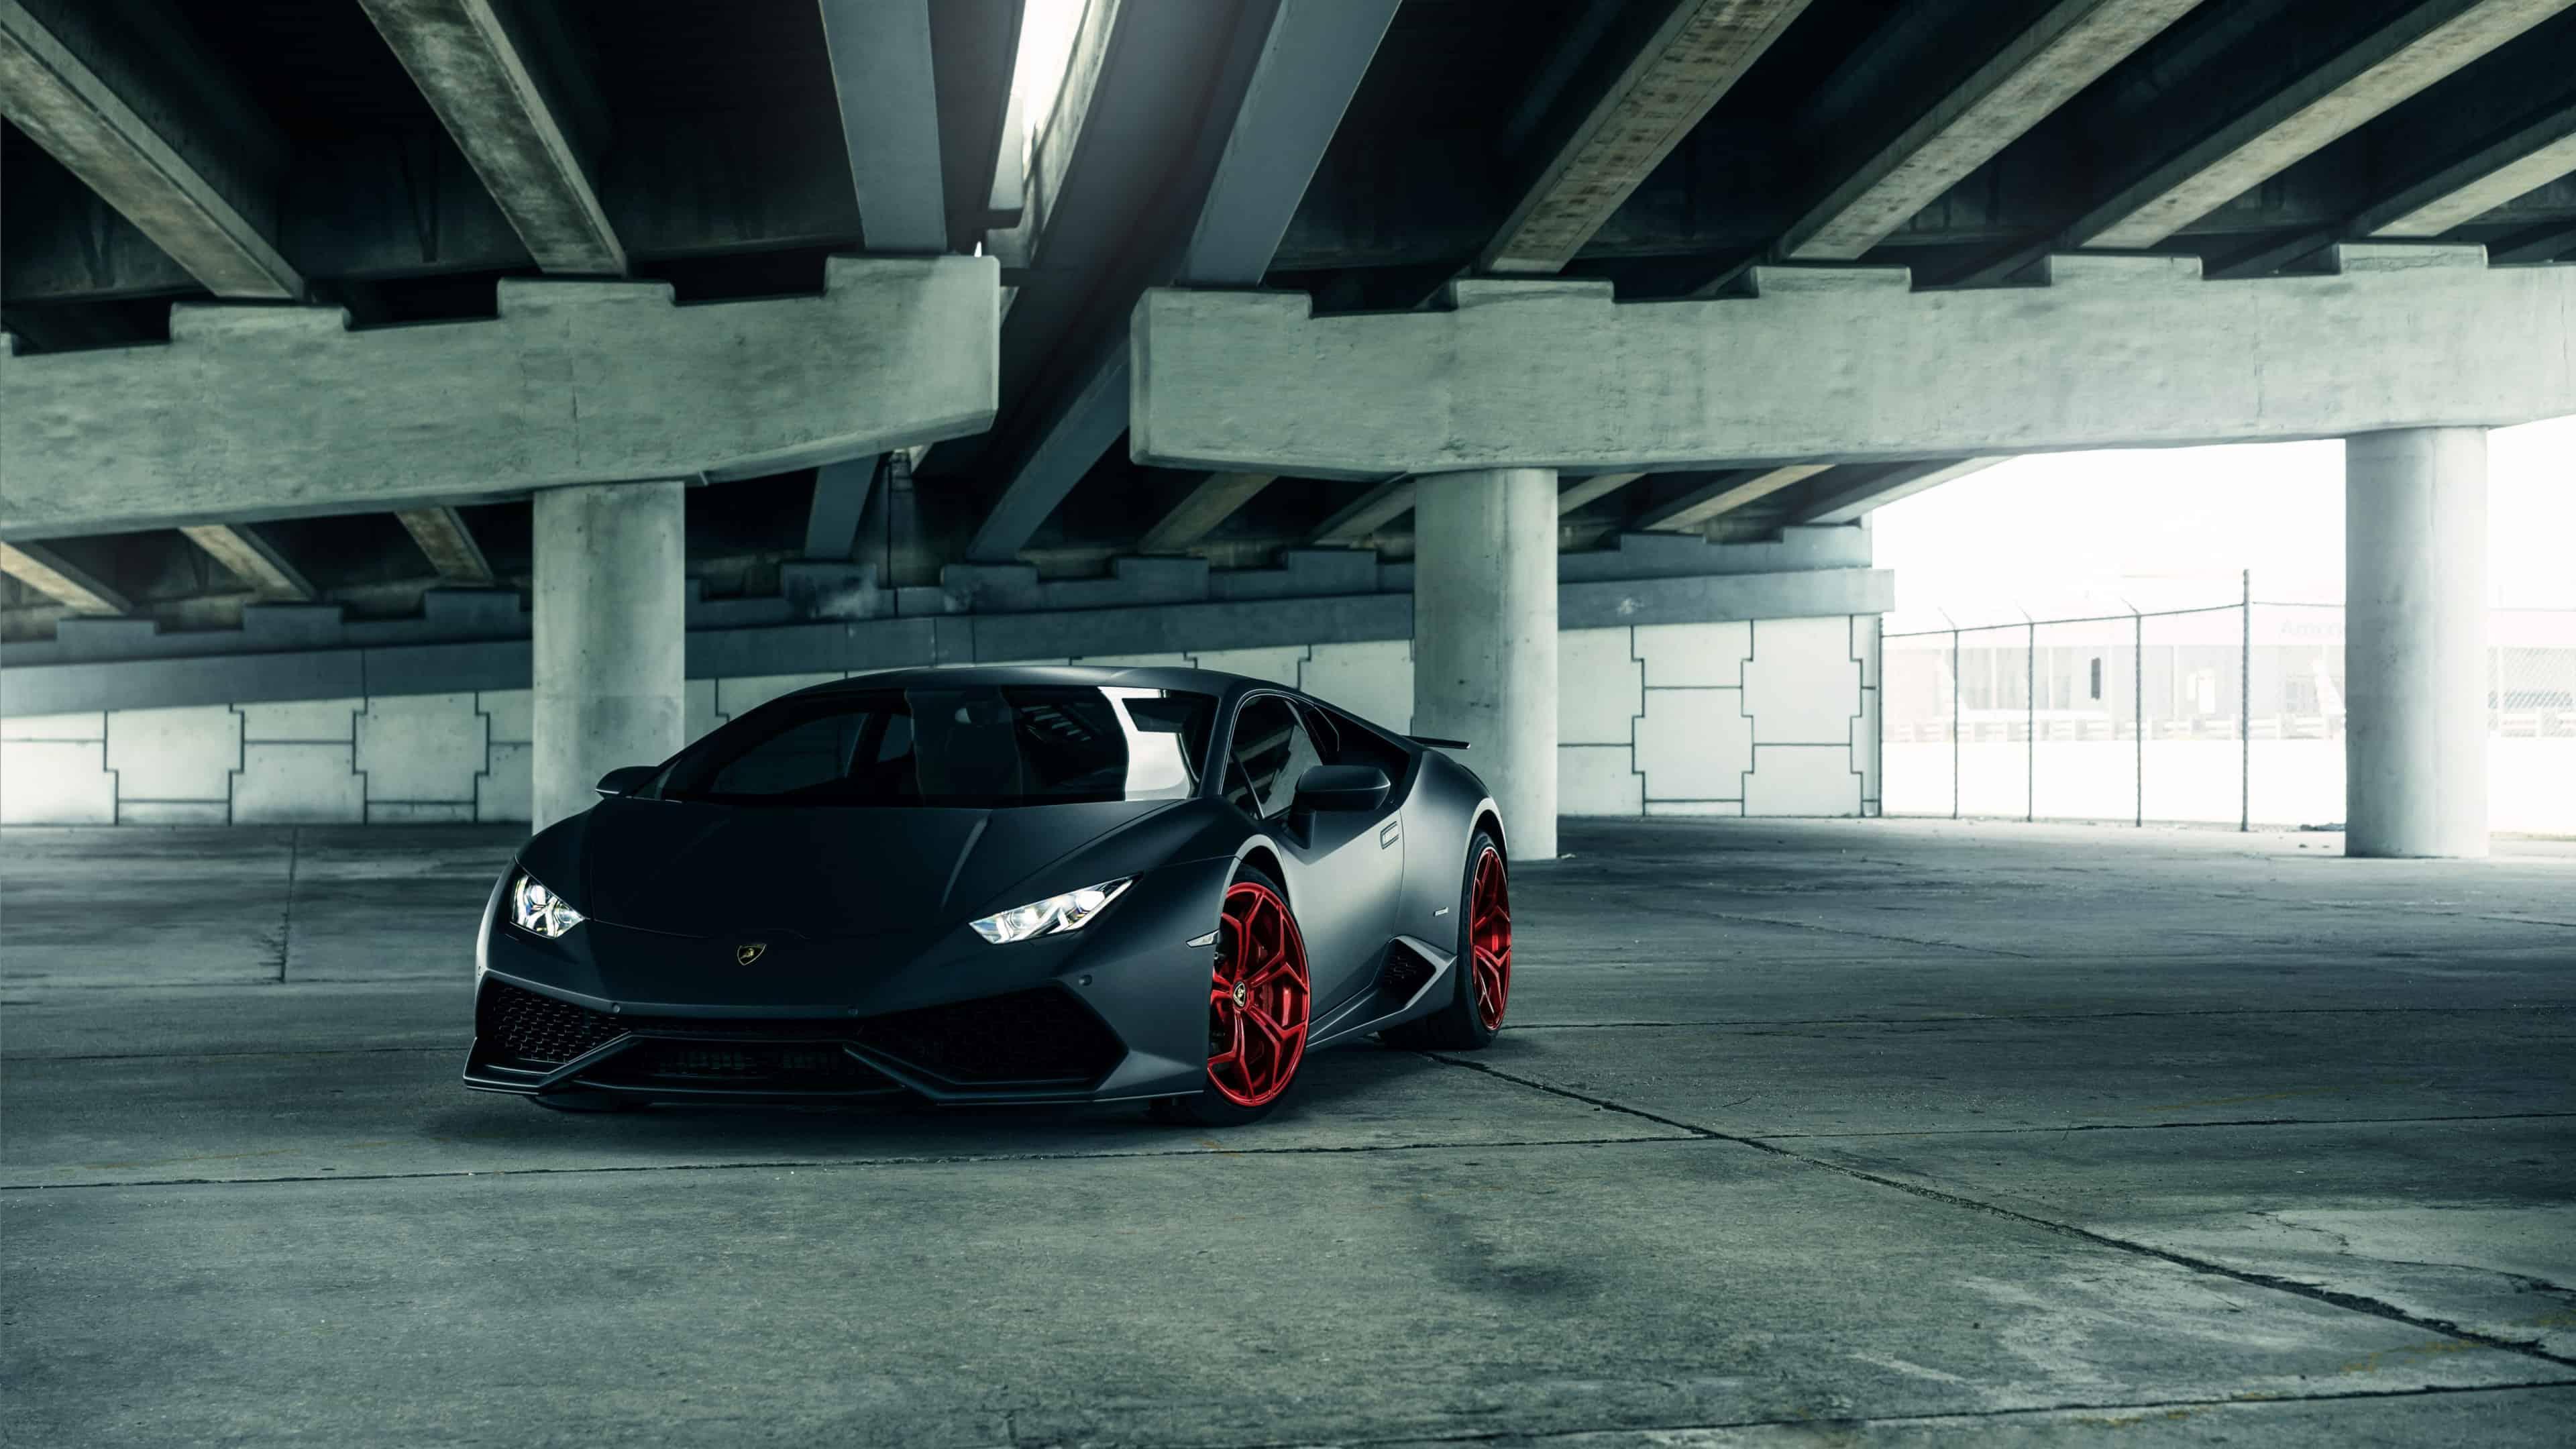 Lamborghini Huracan Black UHD 4K Wallpaper Pixelz 3840x2160